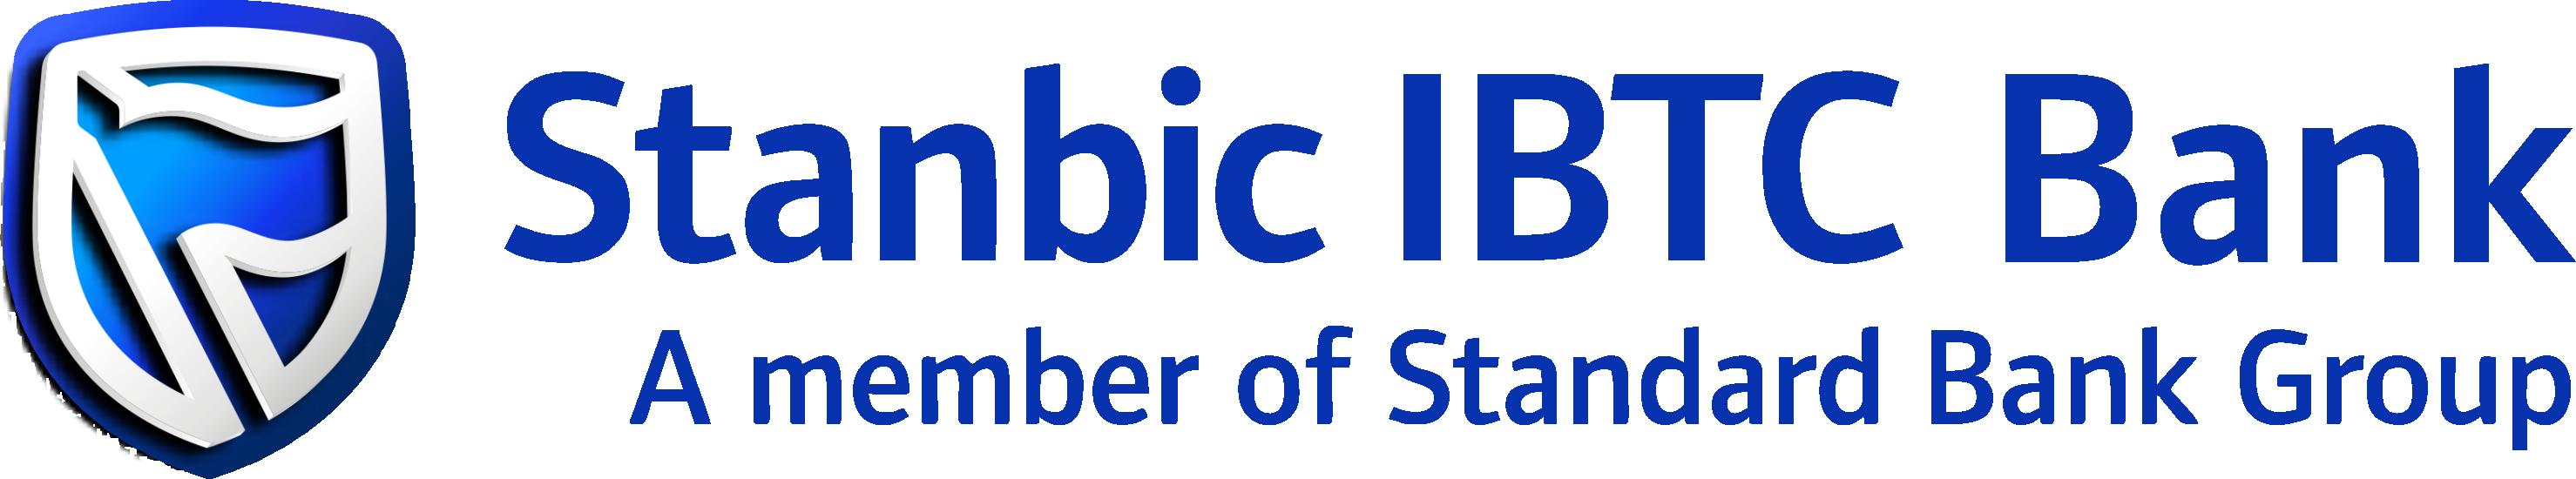 Nigeria, stanbic IBTC